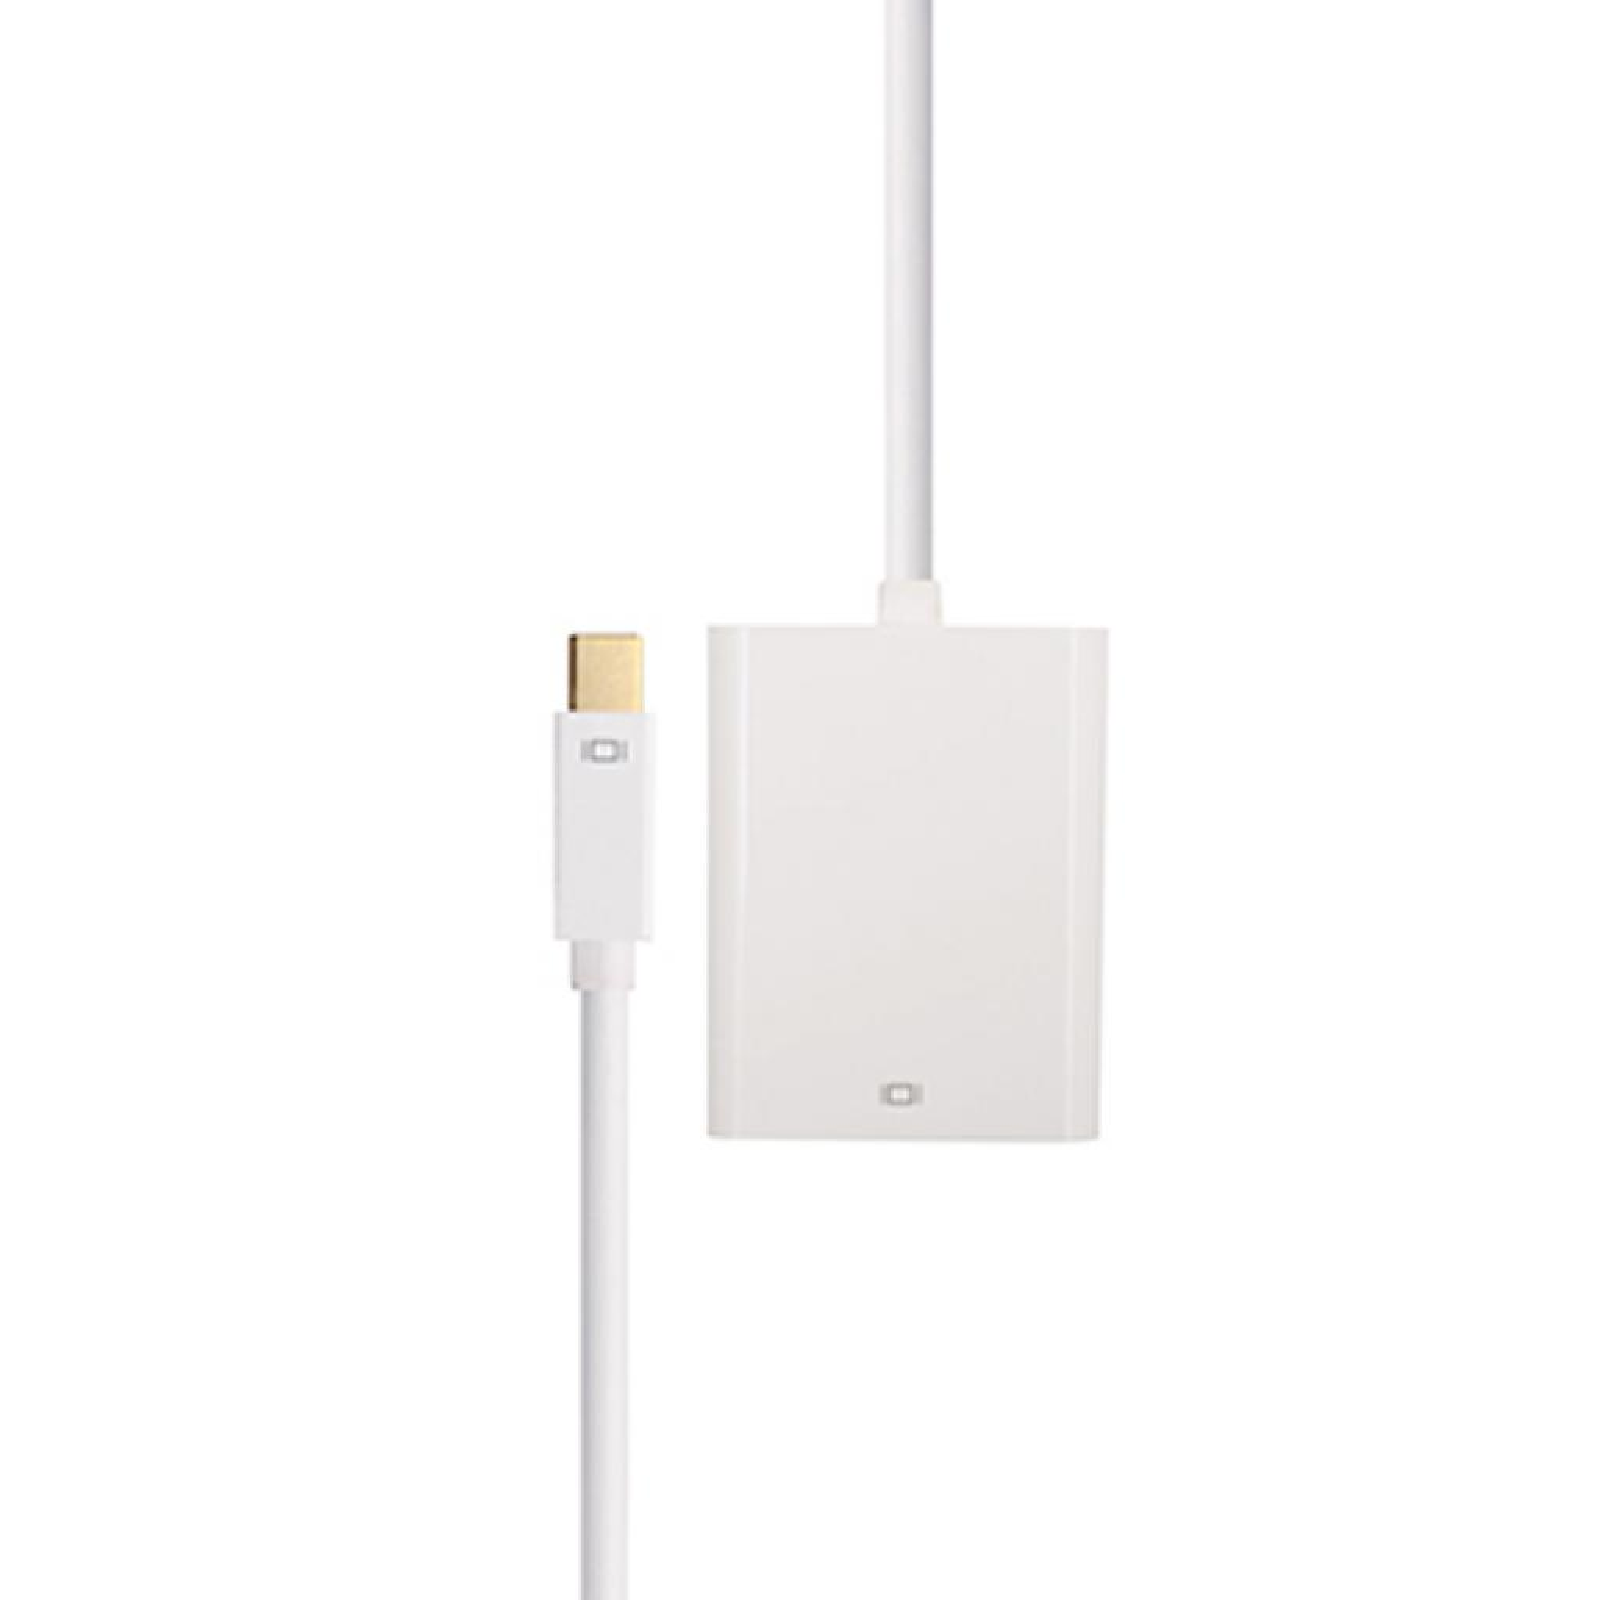 Переходник miniDisplayPort to DVI-D 0.15m Prolink (MP350)